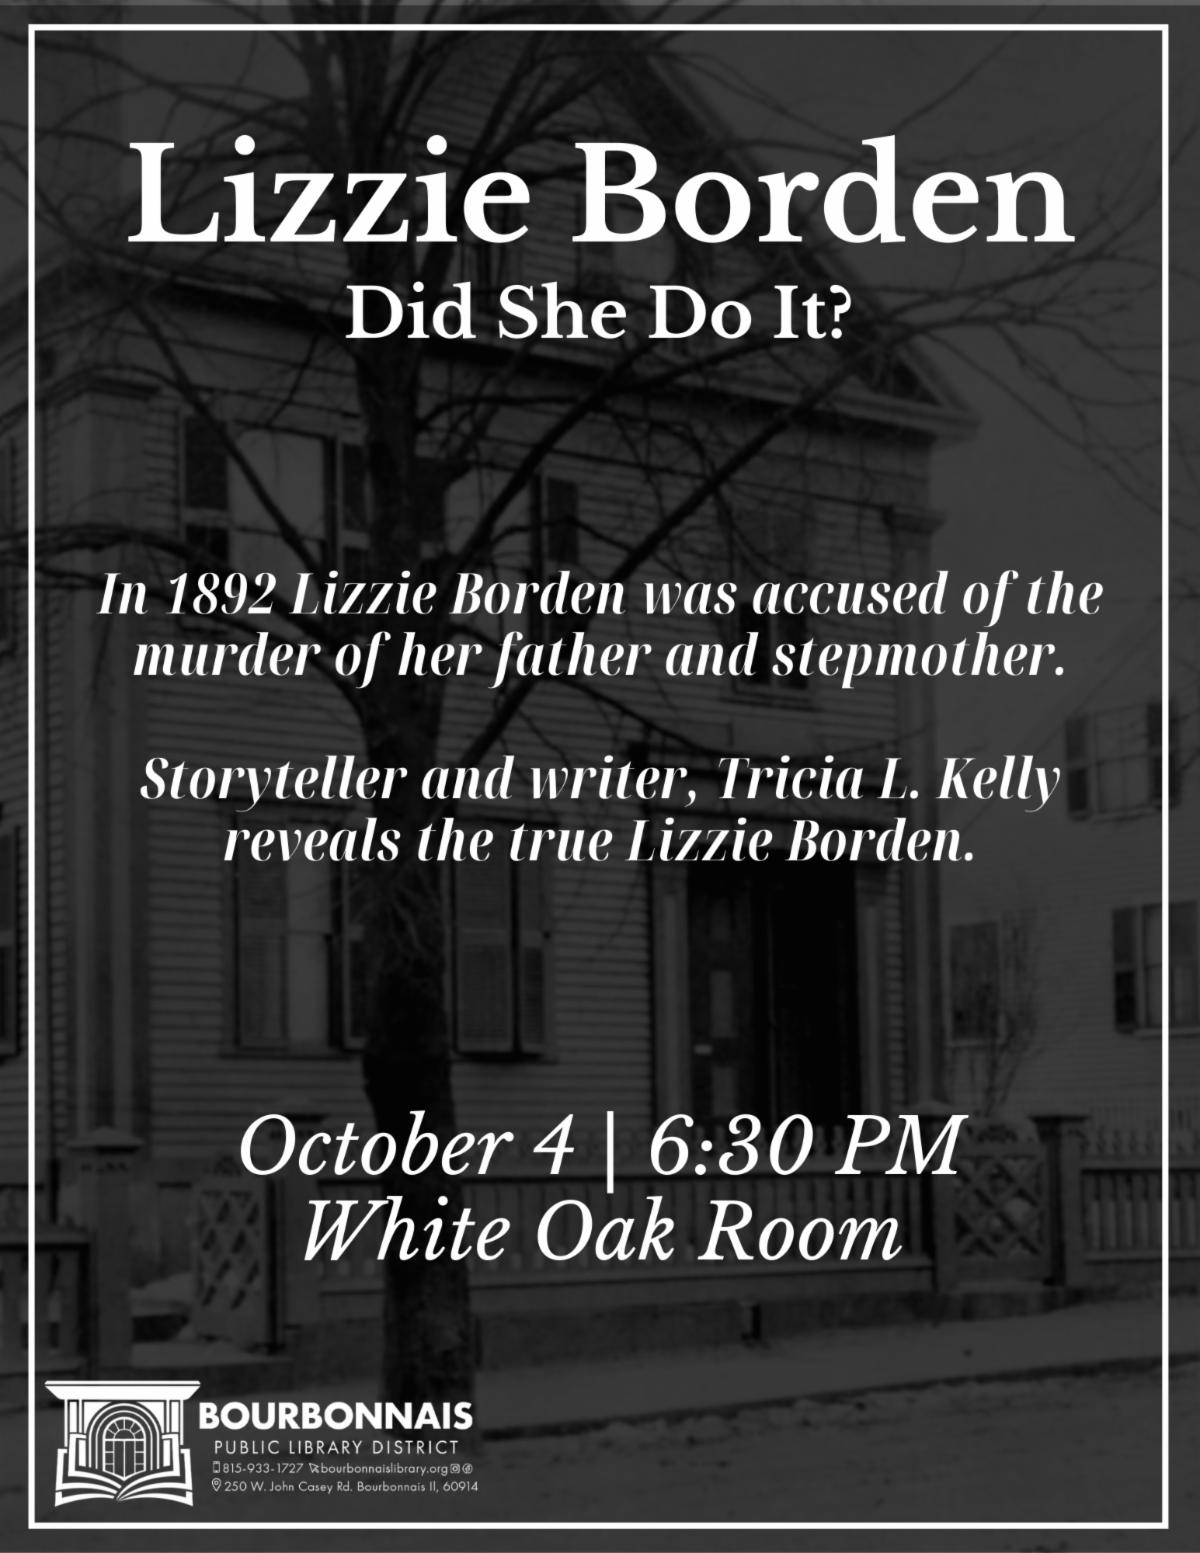 Lizzie Borden: Did She Do It?